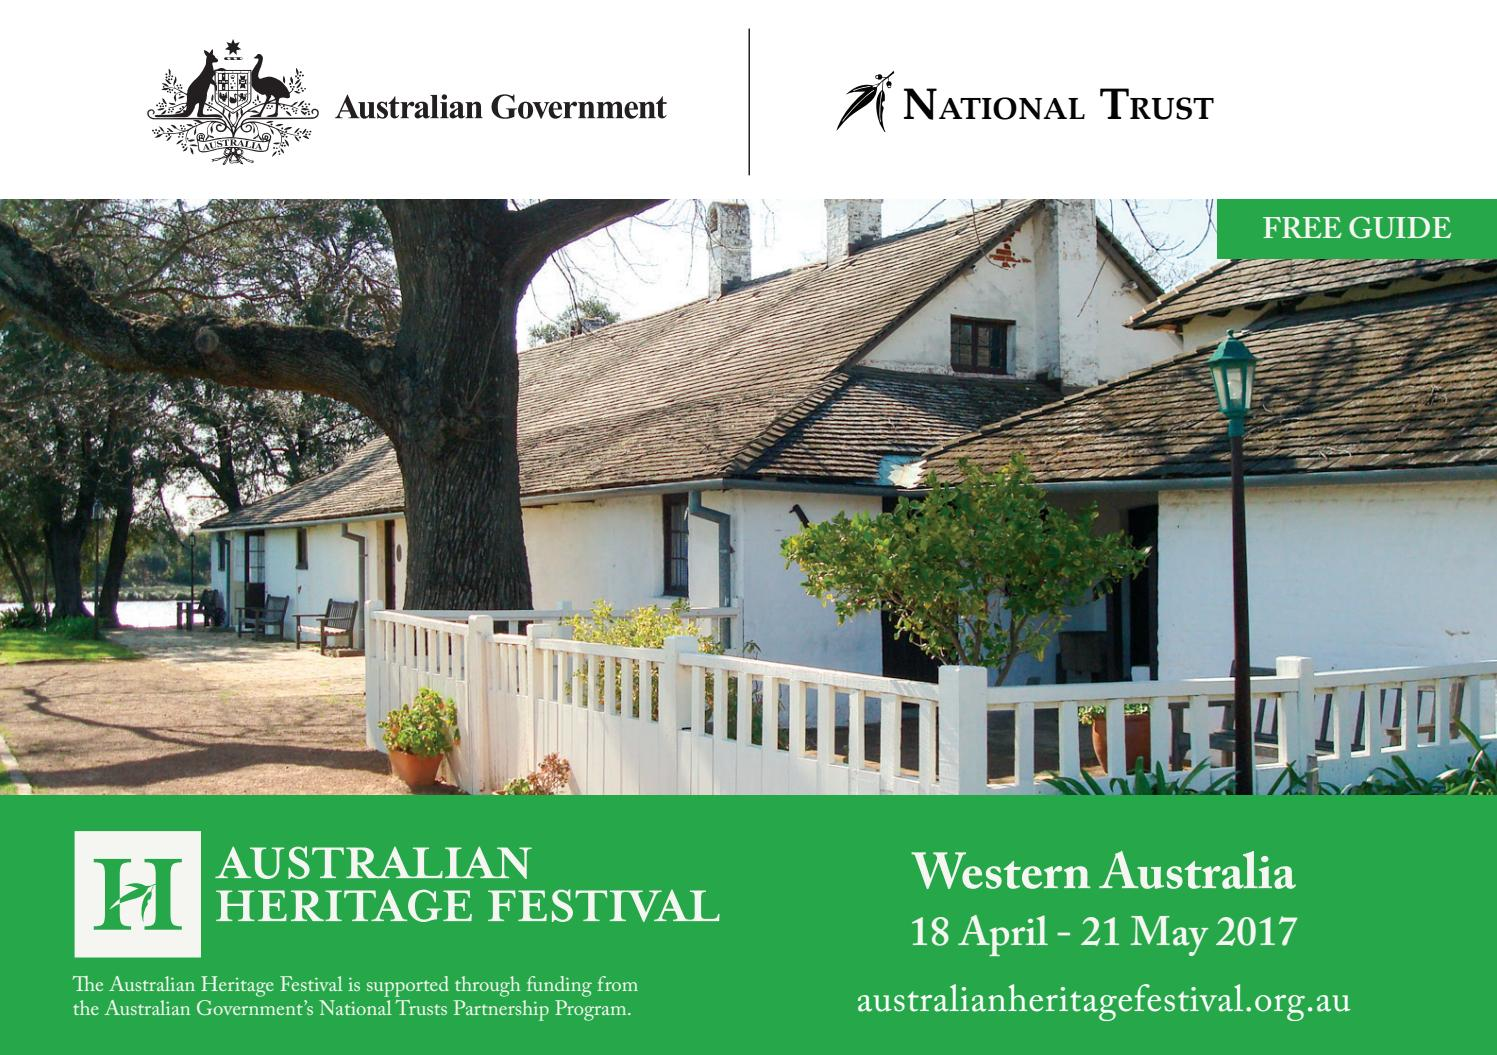 2017 Australian Heritage Festival WA Programme by The